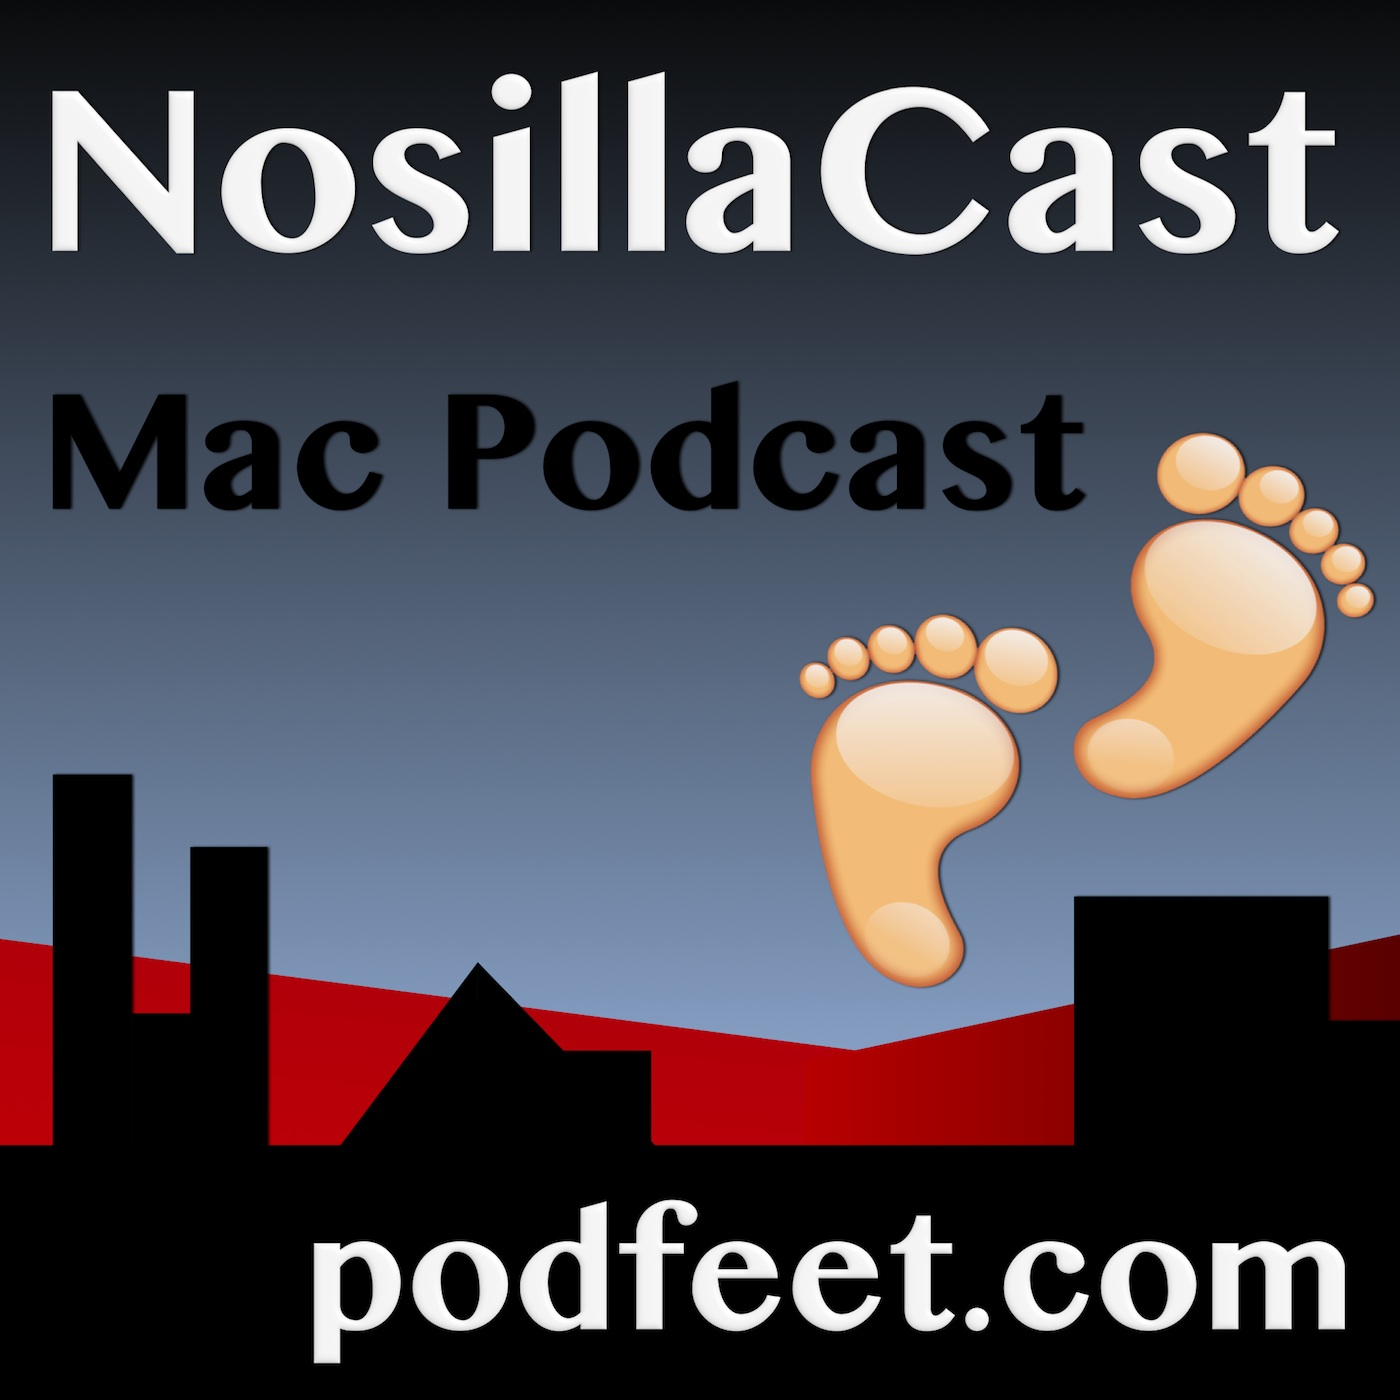 NosillaCast Mac Podcast